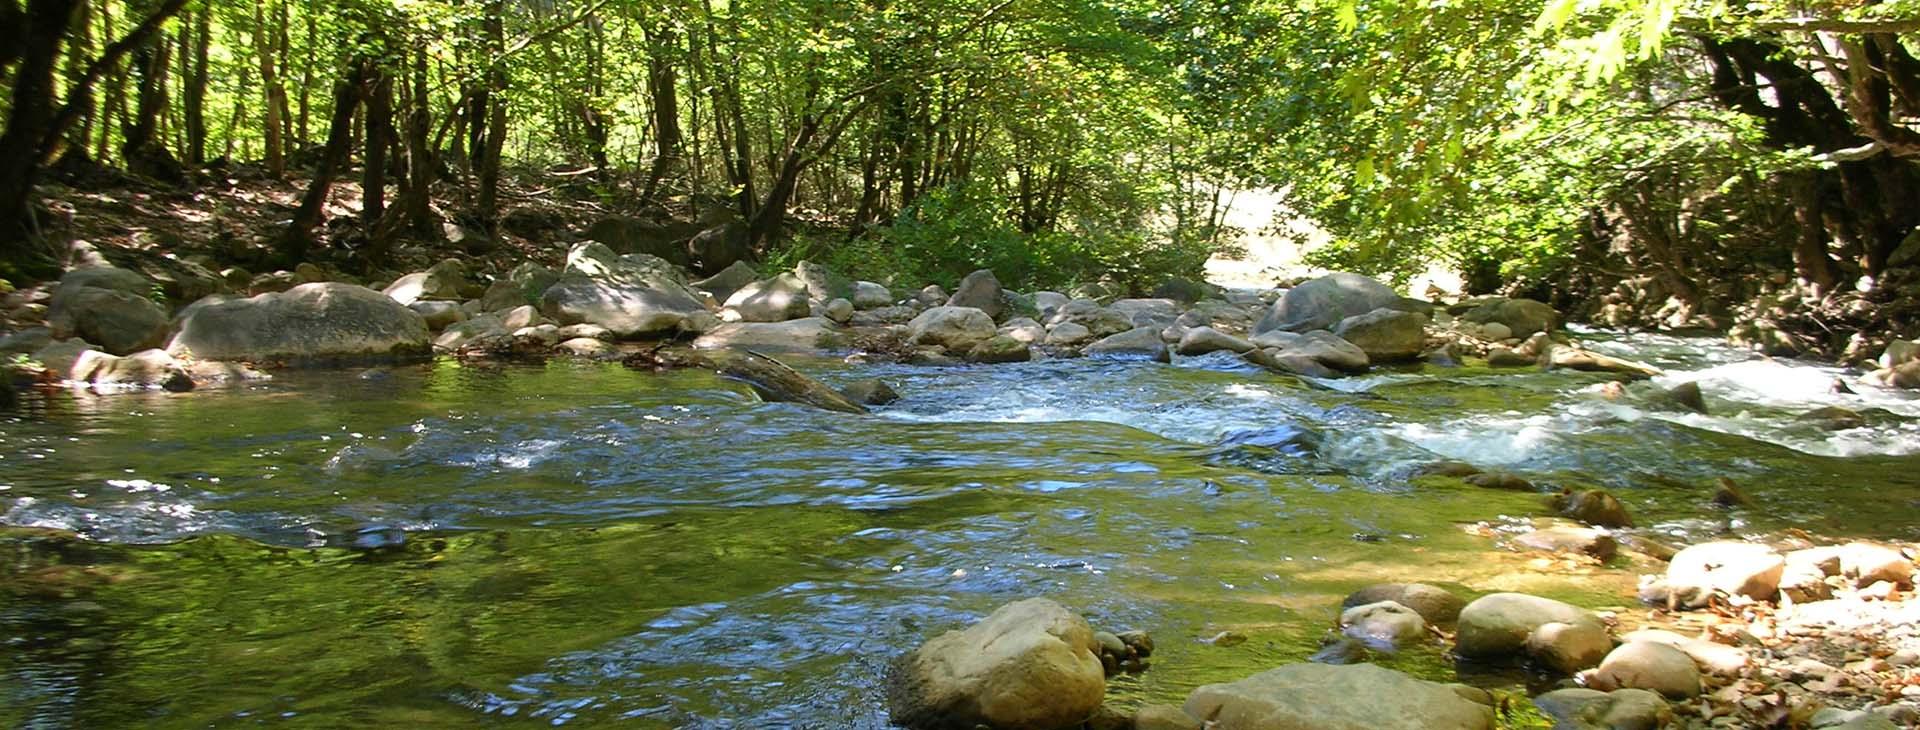 Karpenisiotis river, Evritania